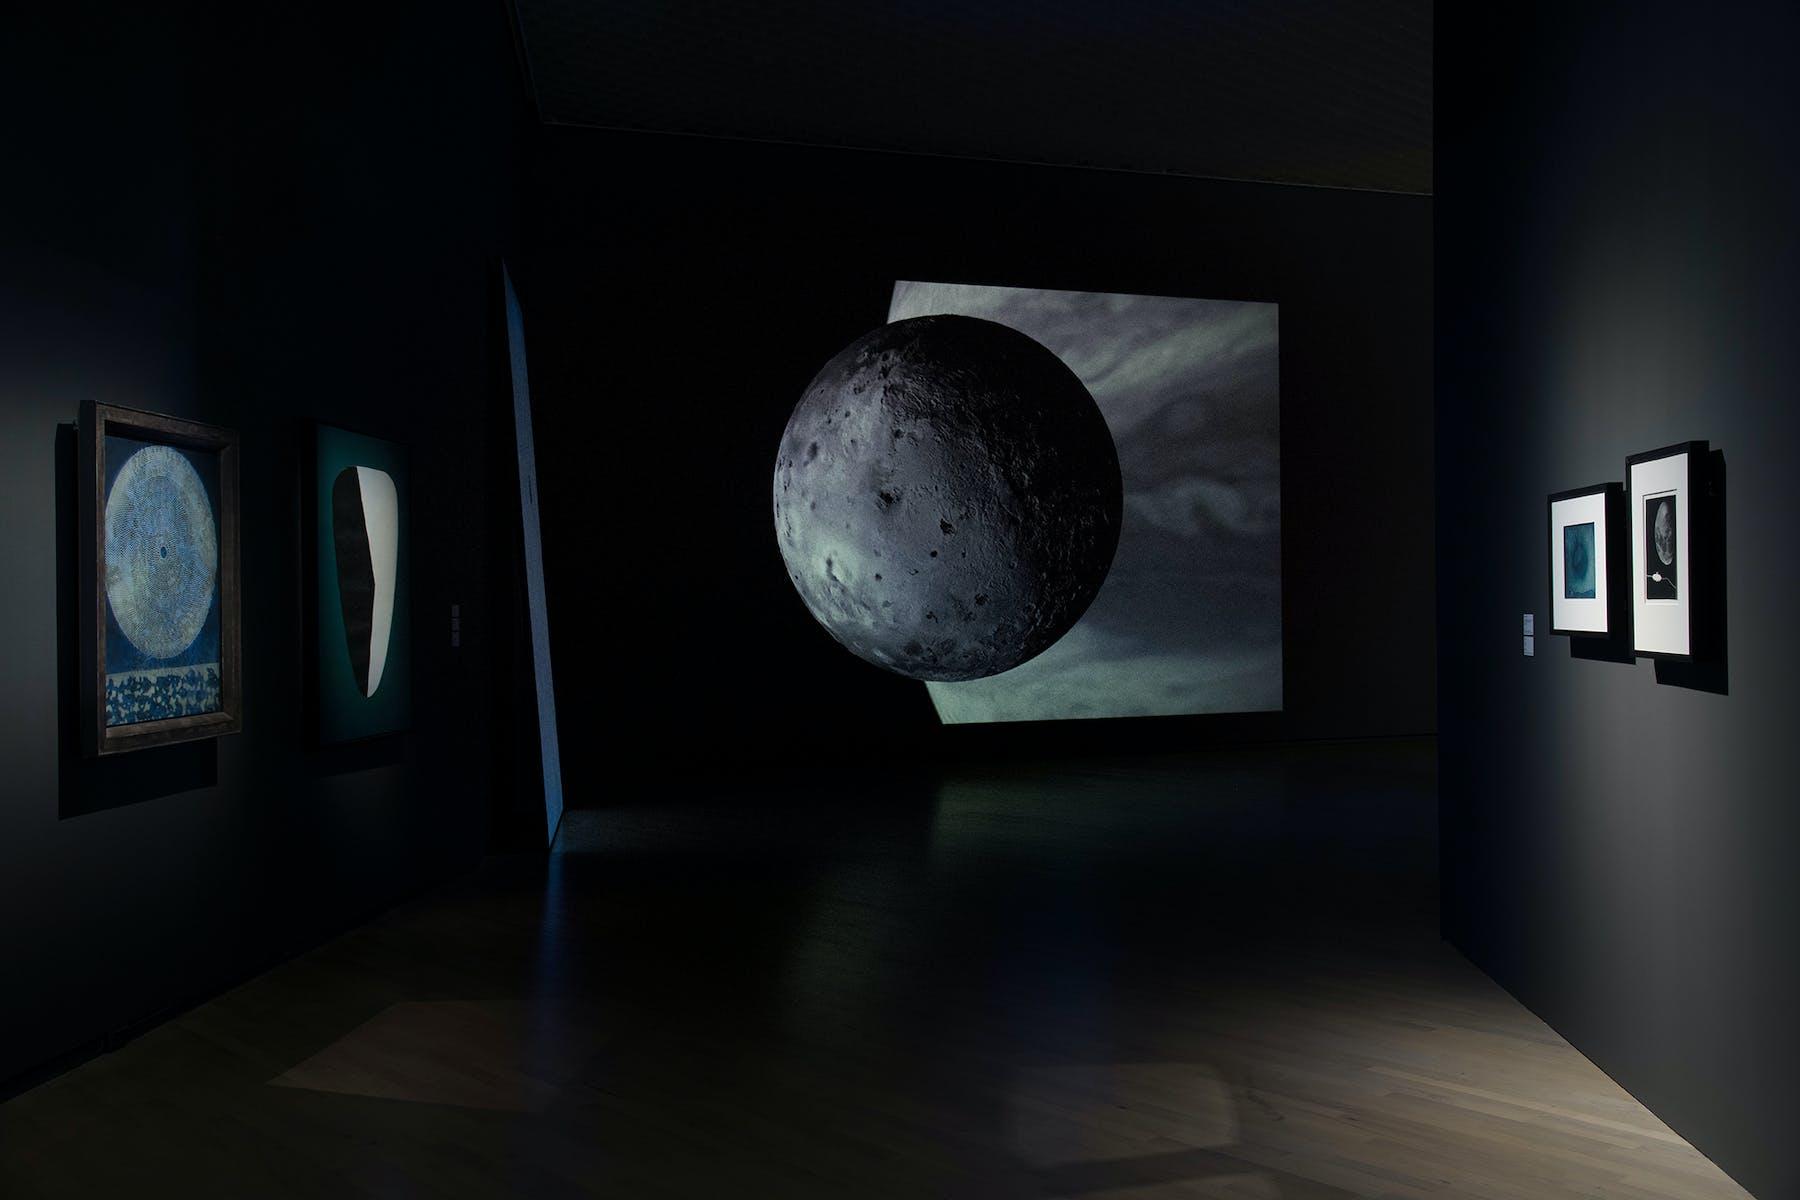 Månen DSC2275